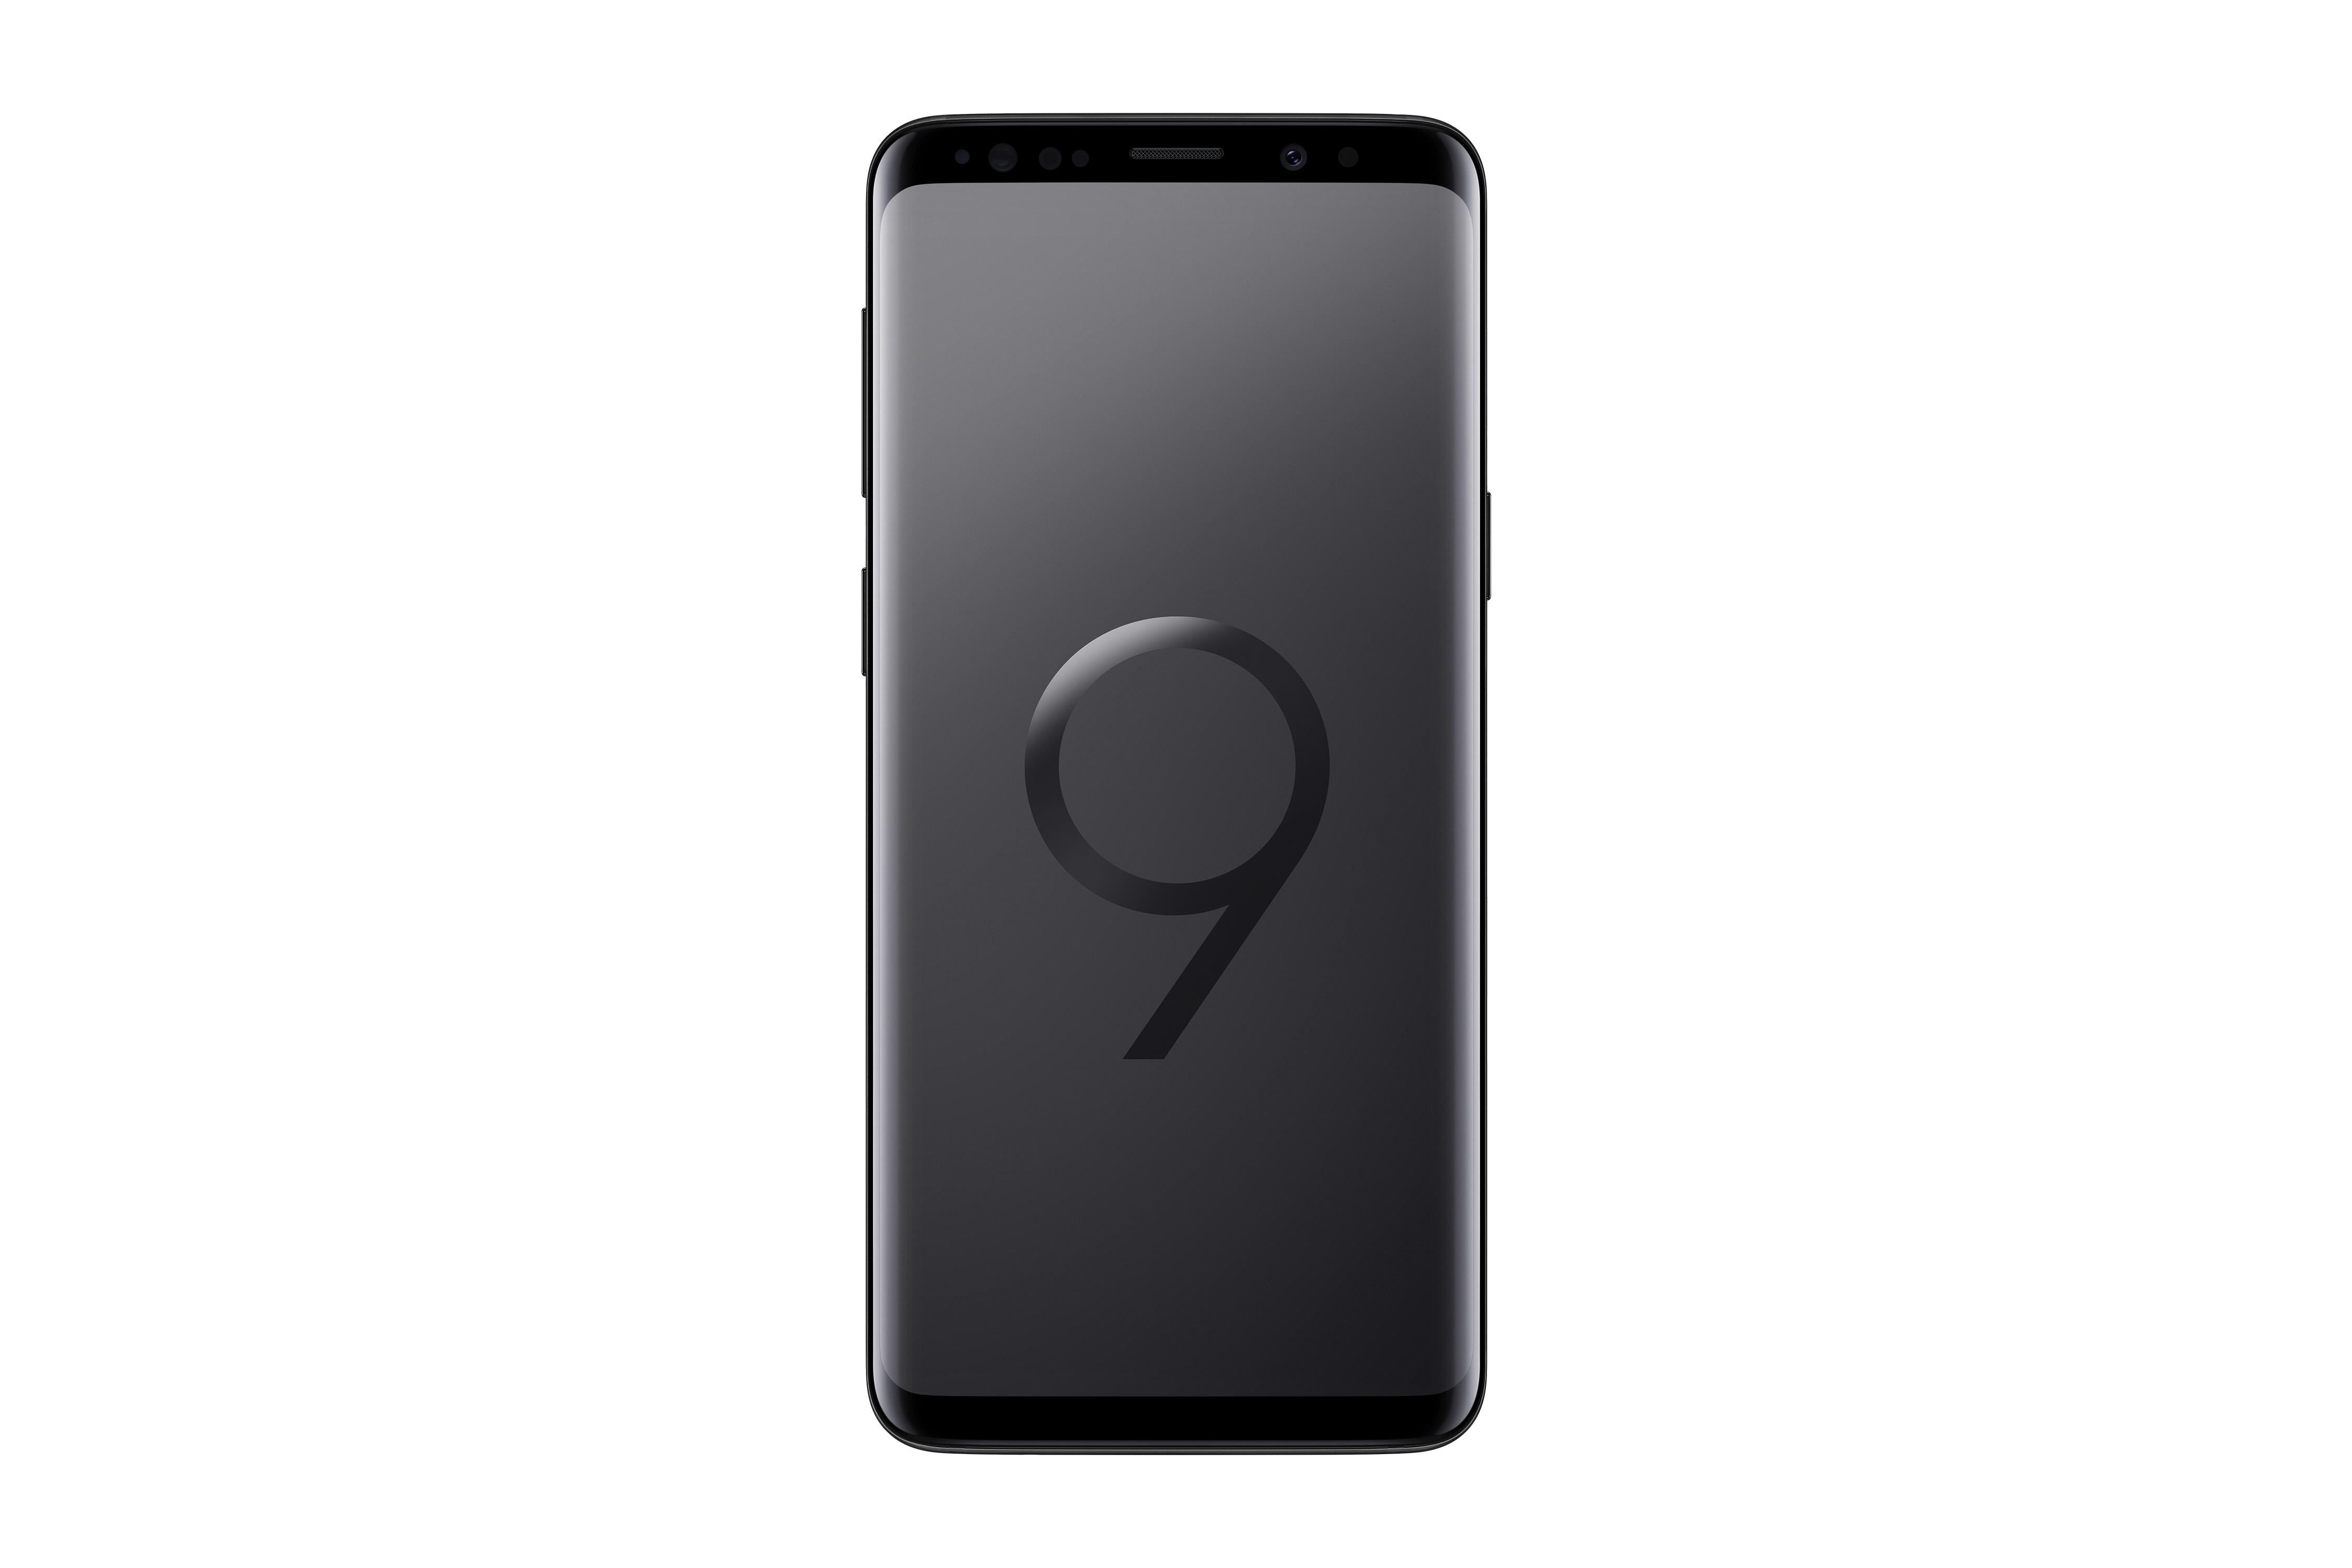 The Samsung Galaxy S9 in black.